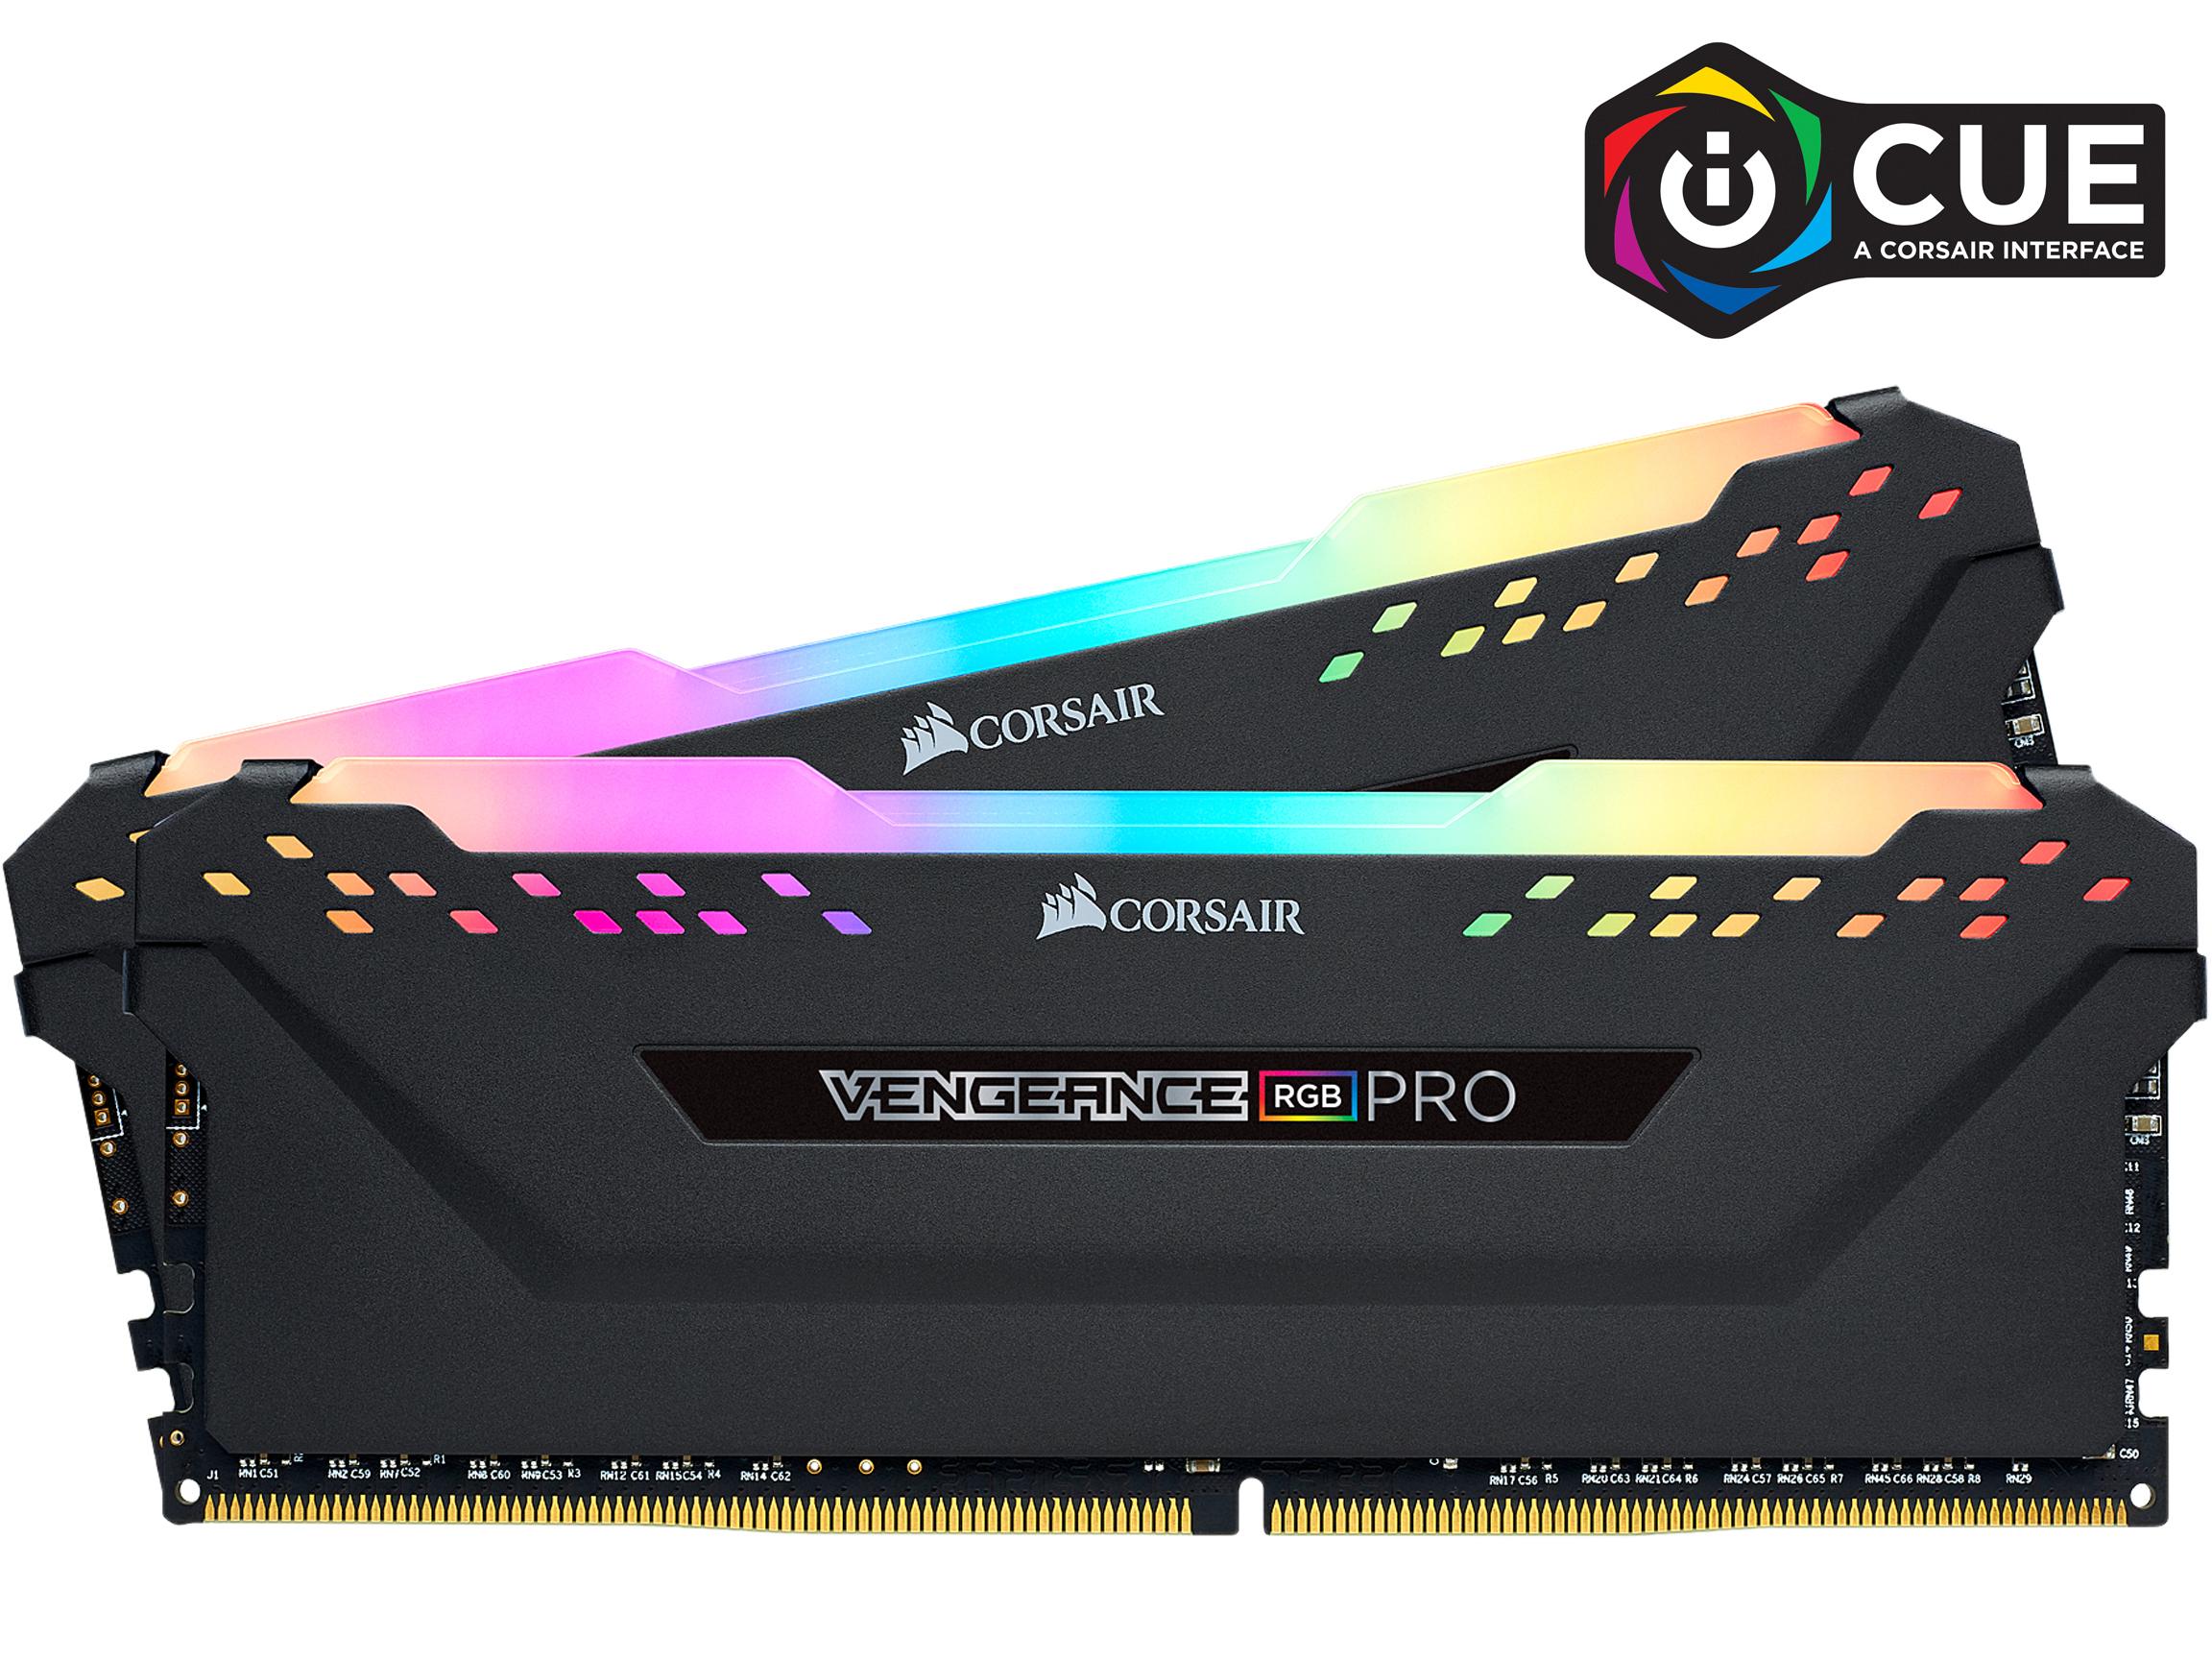 corsair Vengeance RGB Pro 32GB (2 x 16GB) 288-Pin DDR4 SDRAM DDR4 3600 Intel XMP 2.0 Memory CMW32GX4M2Z3600C18